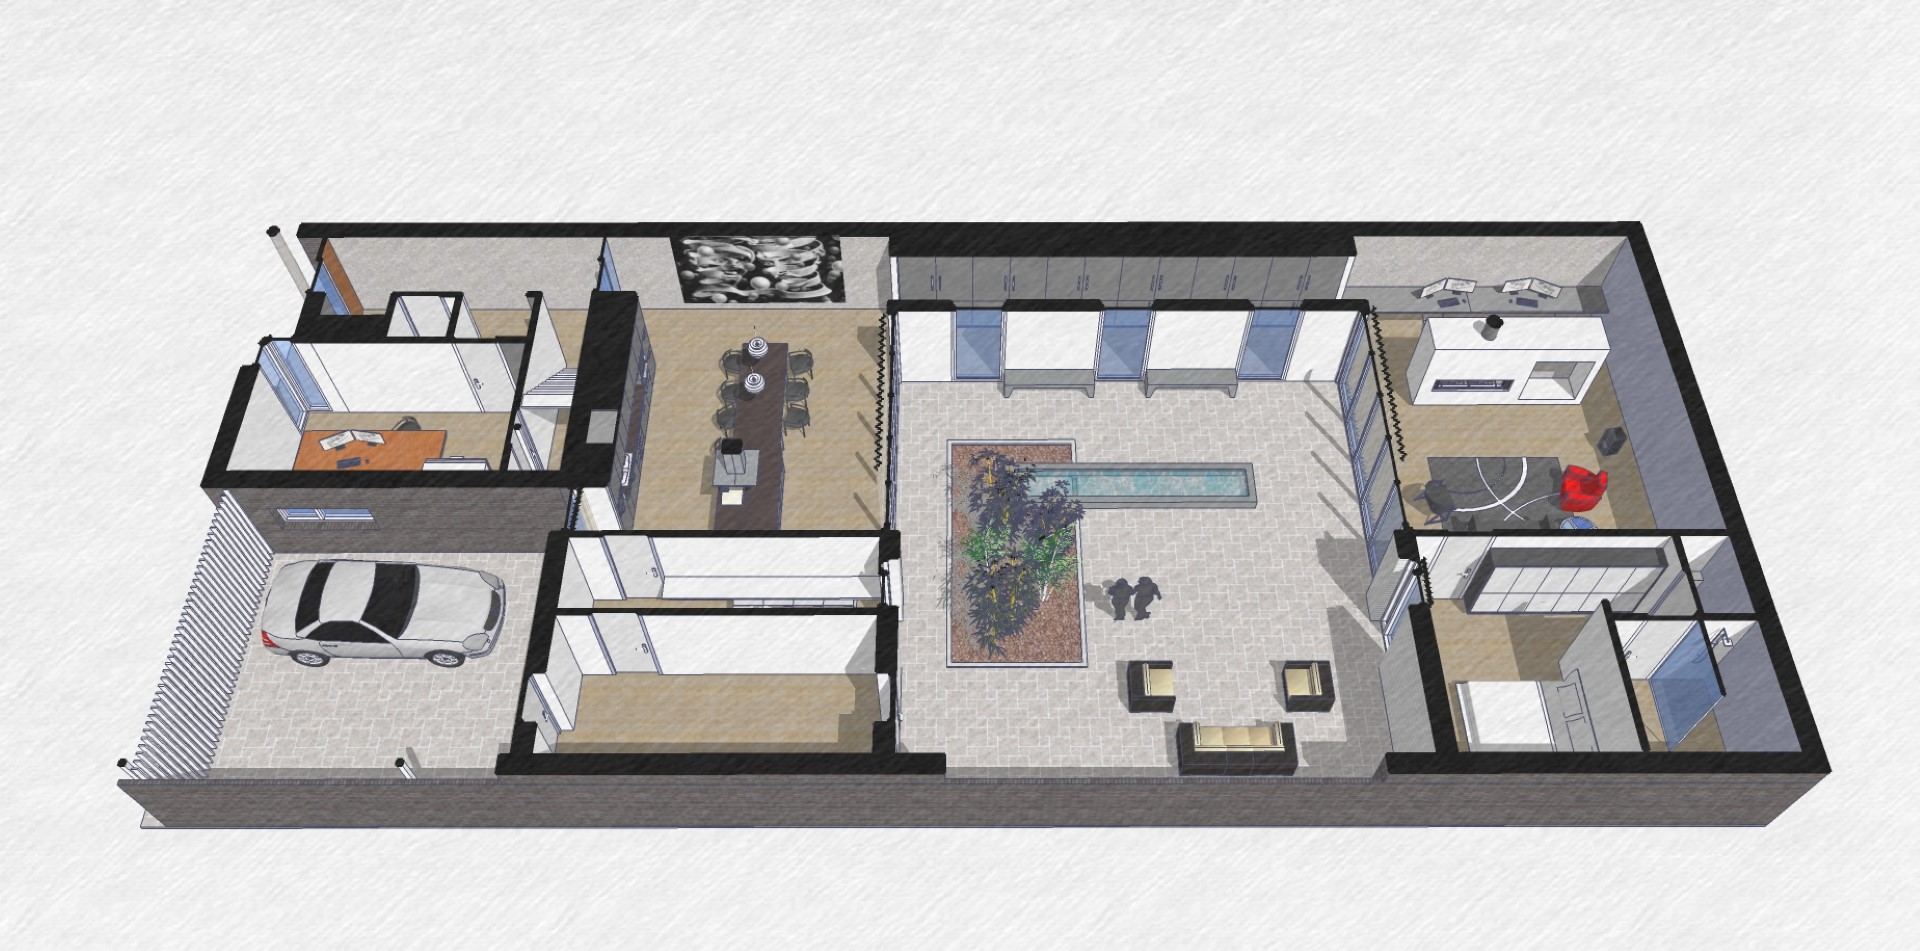 patiowoning 1